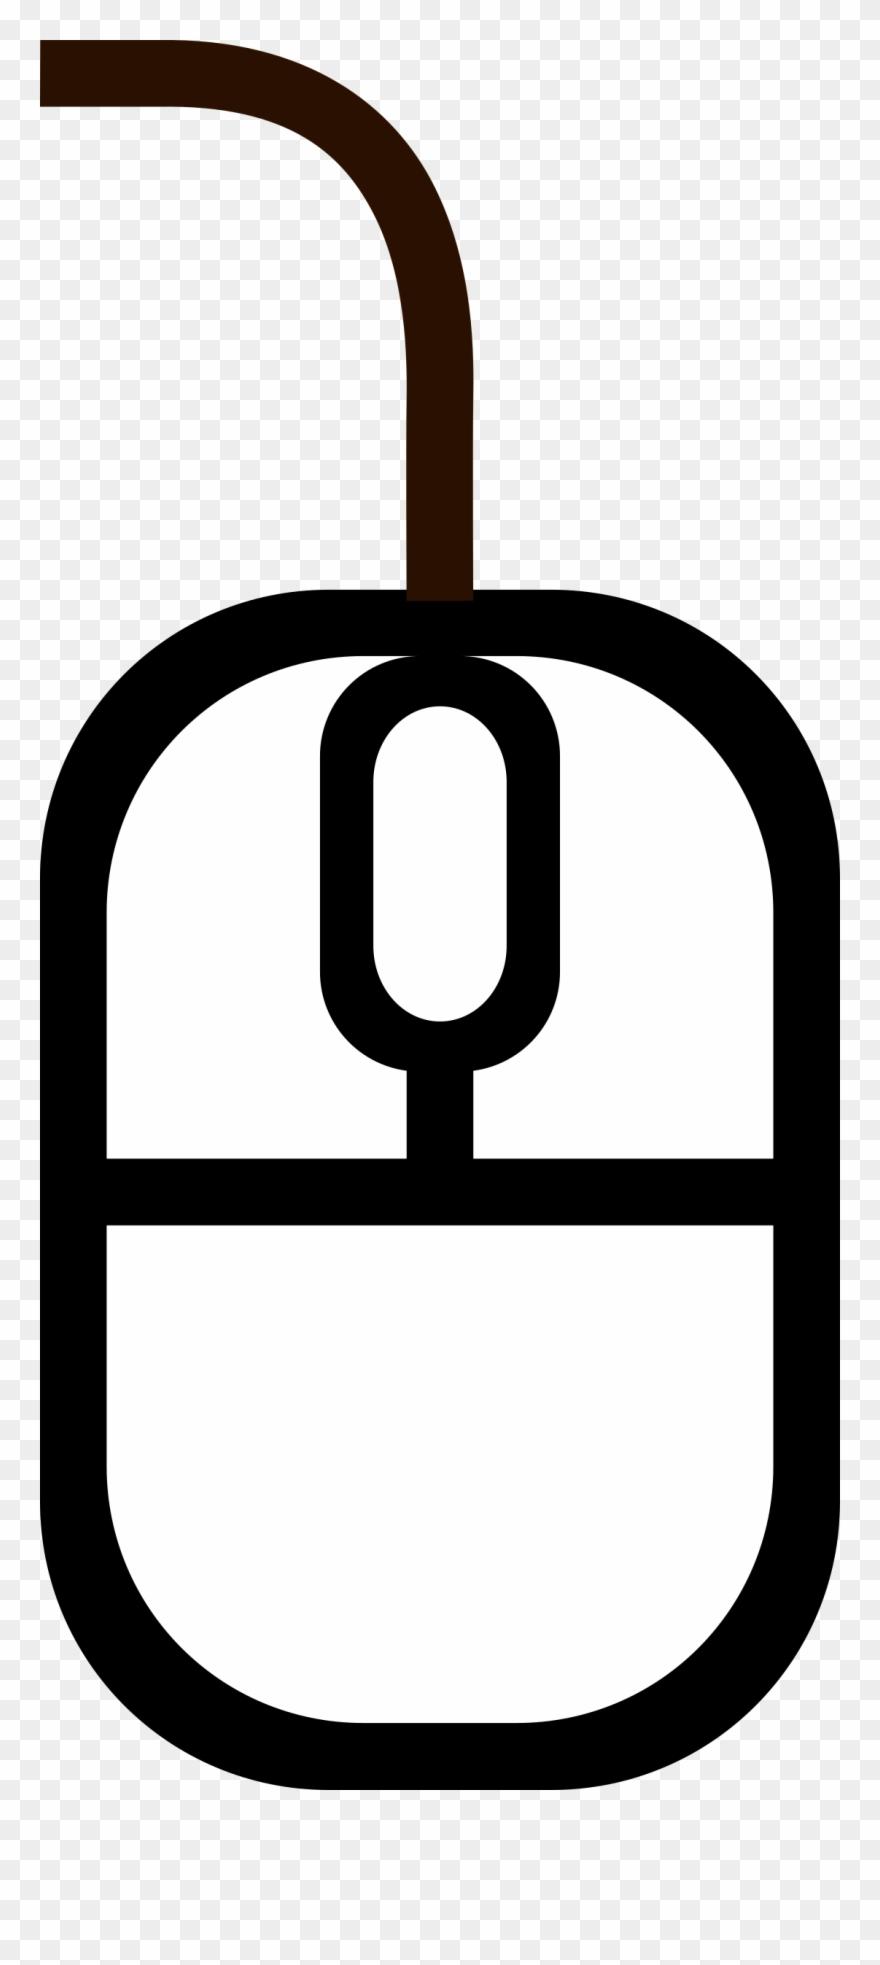 Keyboard clipart big. Image mouse symbol